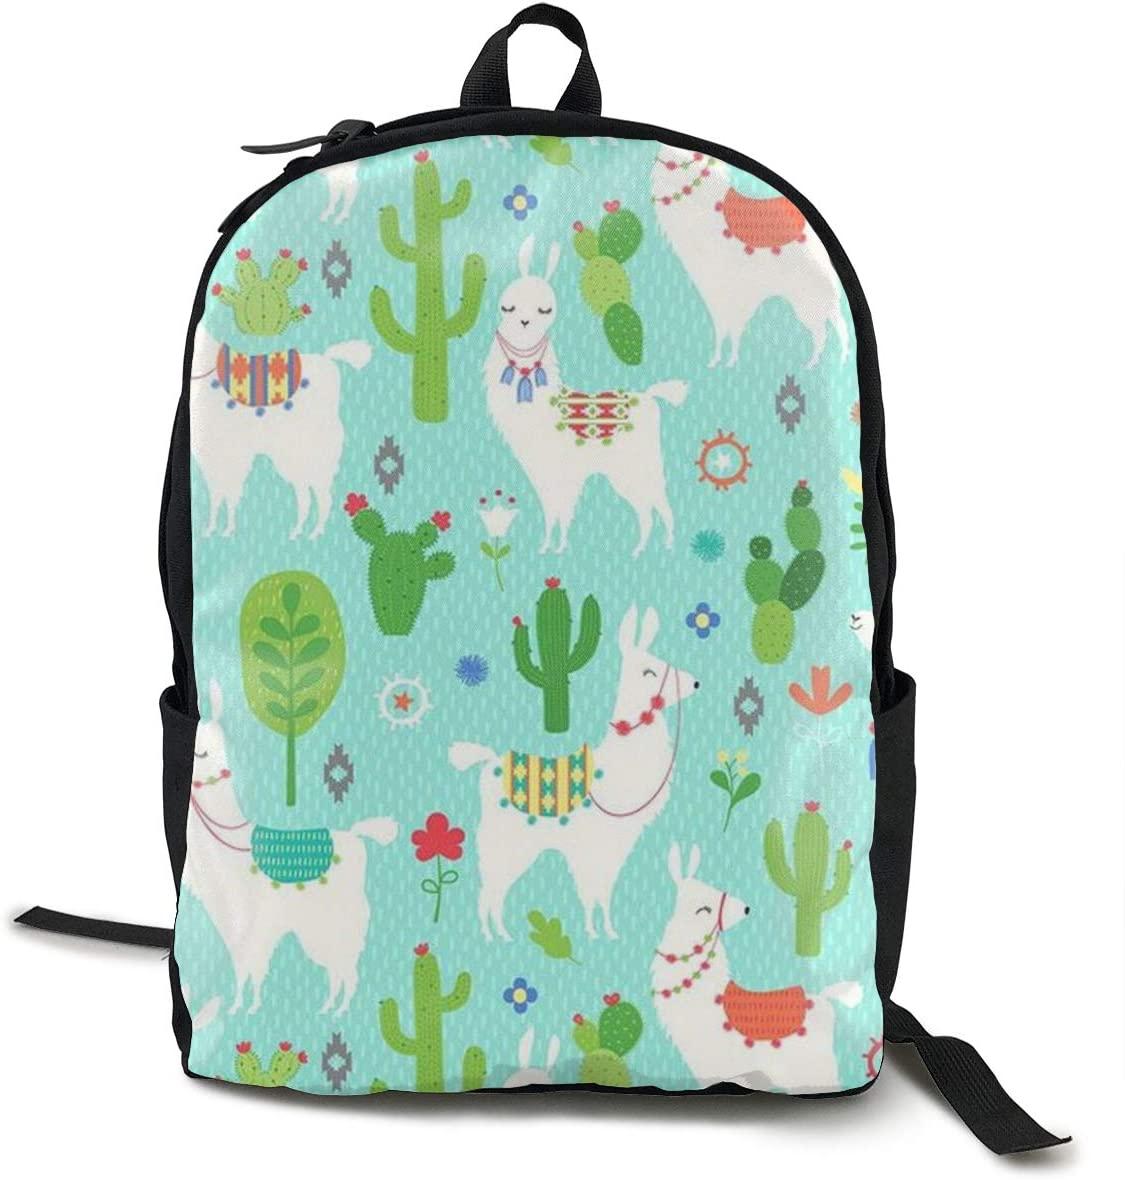 NiYoung Men Women Laptop Backpack Business Travel Anti Theft Daypack Durable College School Bookbag Computer Backpack, Cute Llama